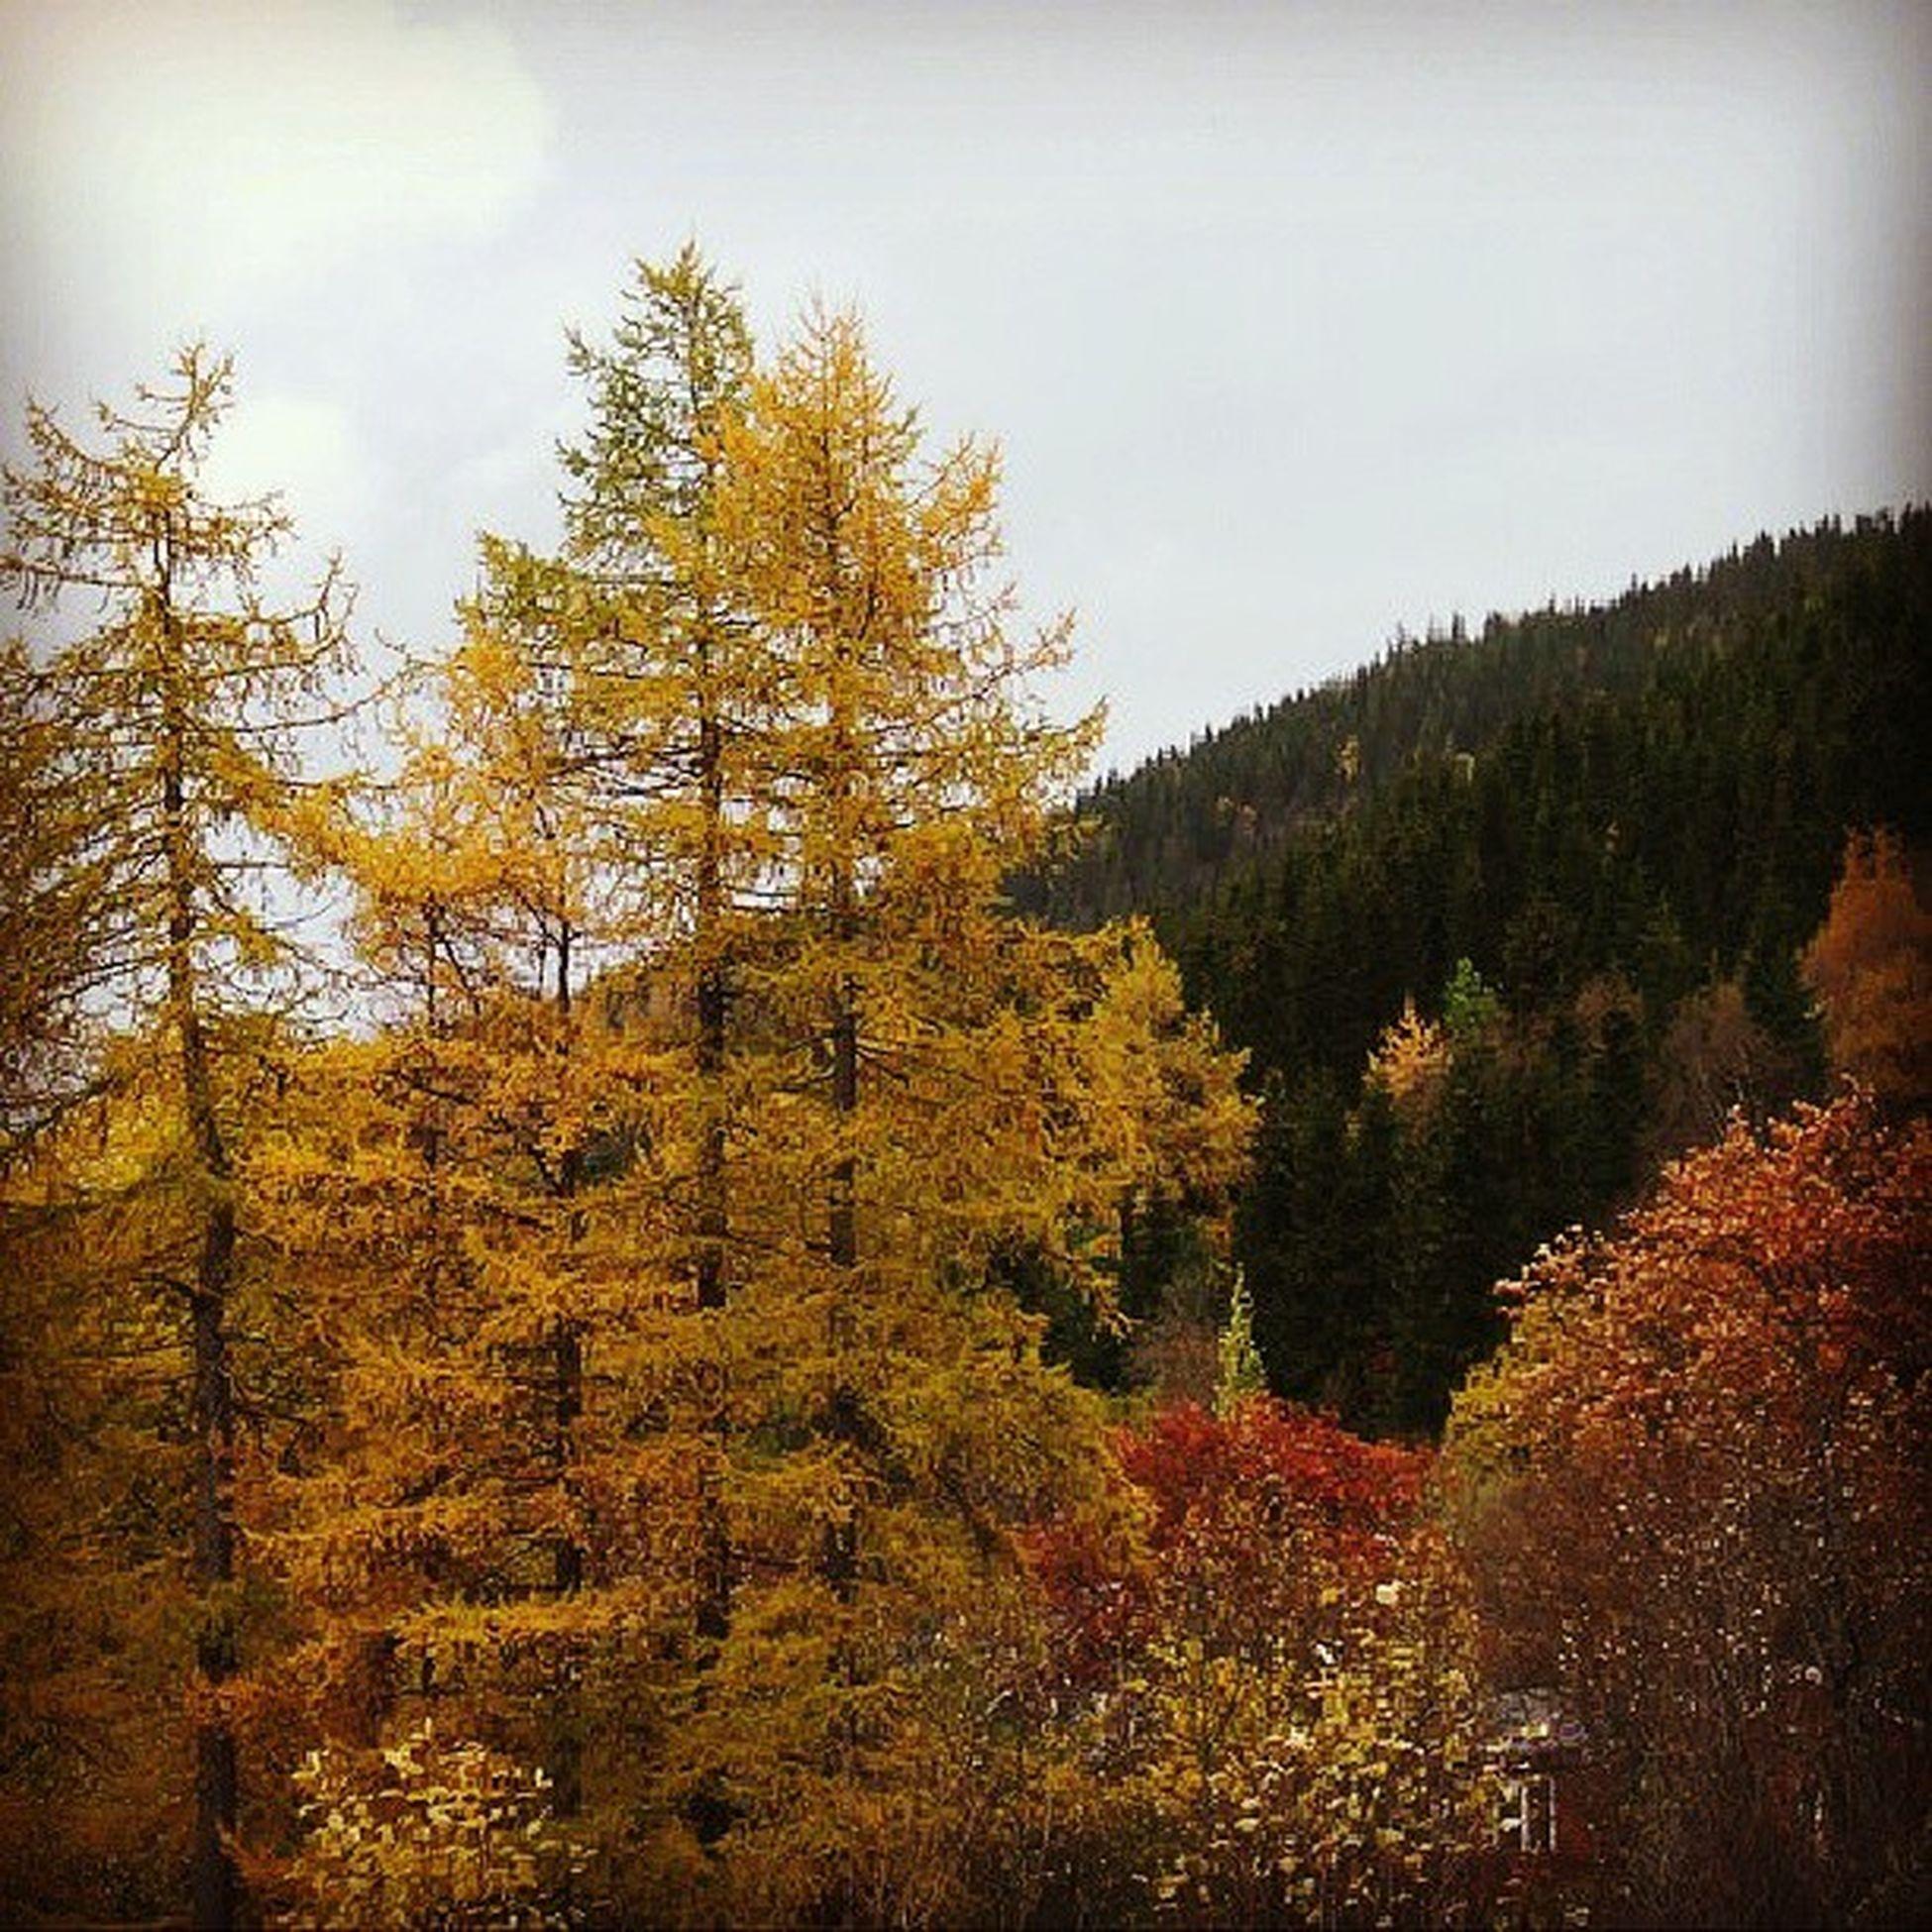 Autumn H øst Ilovenorway Ilovenorway_nordland mosjøen norge norway nordland